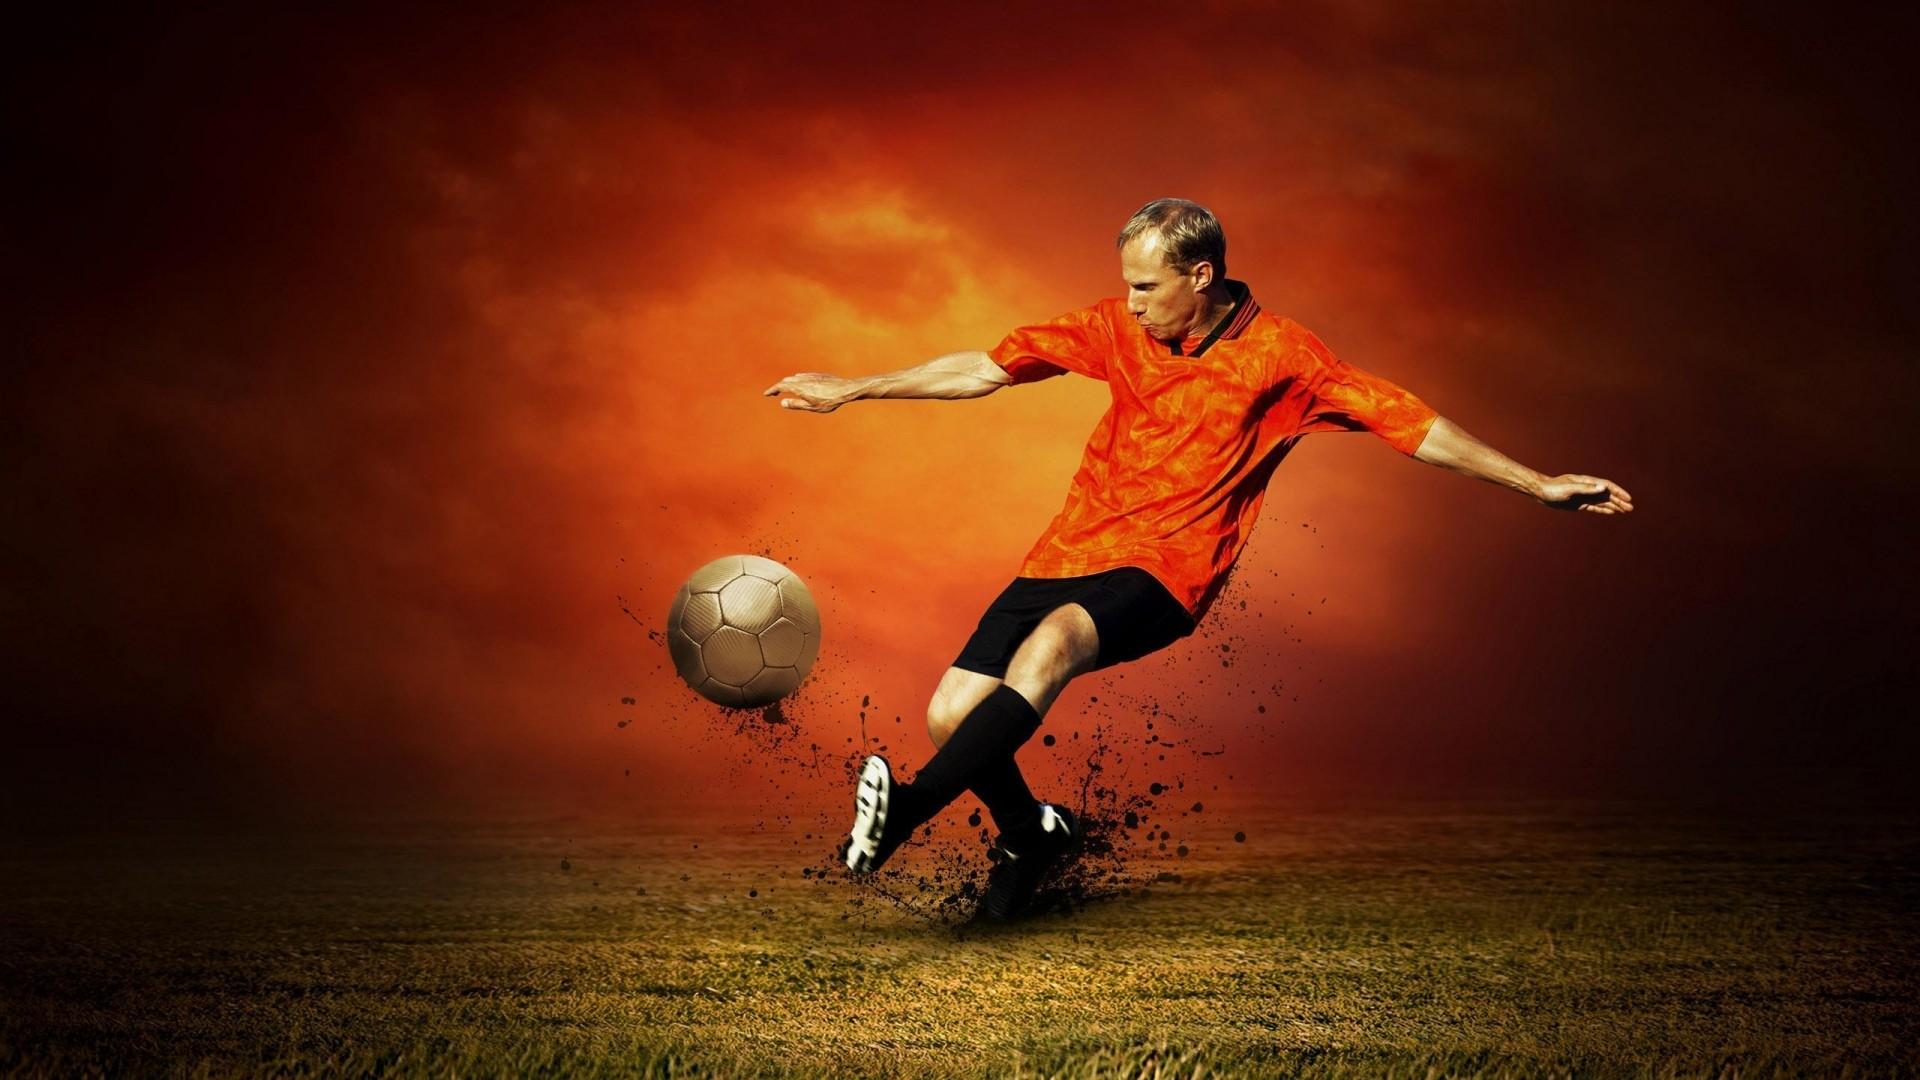 Soccer Sports HD Wallpaper